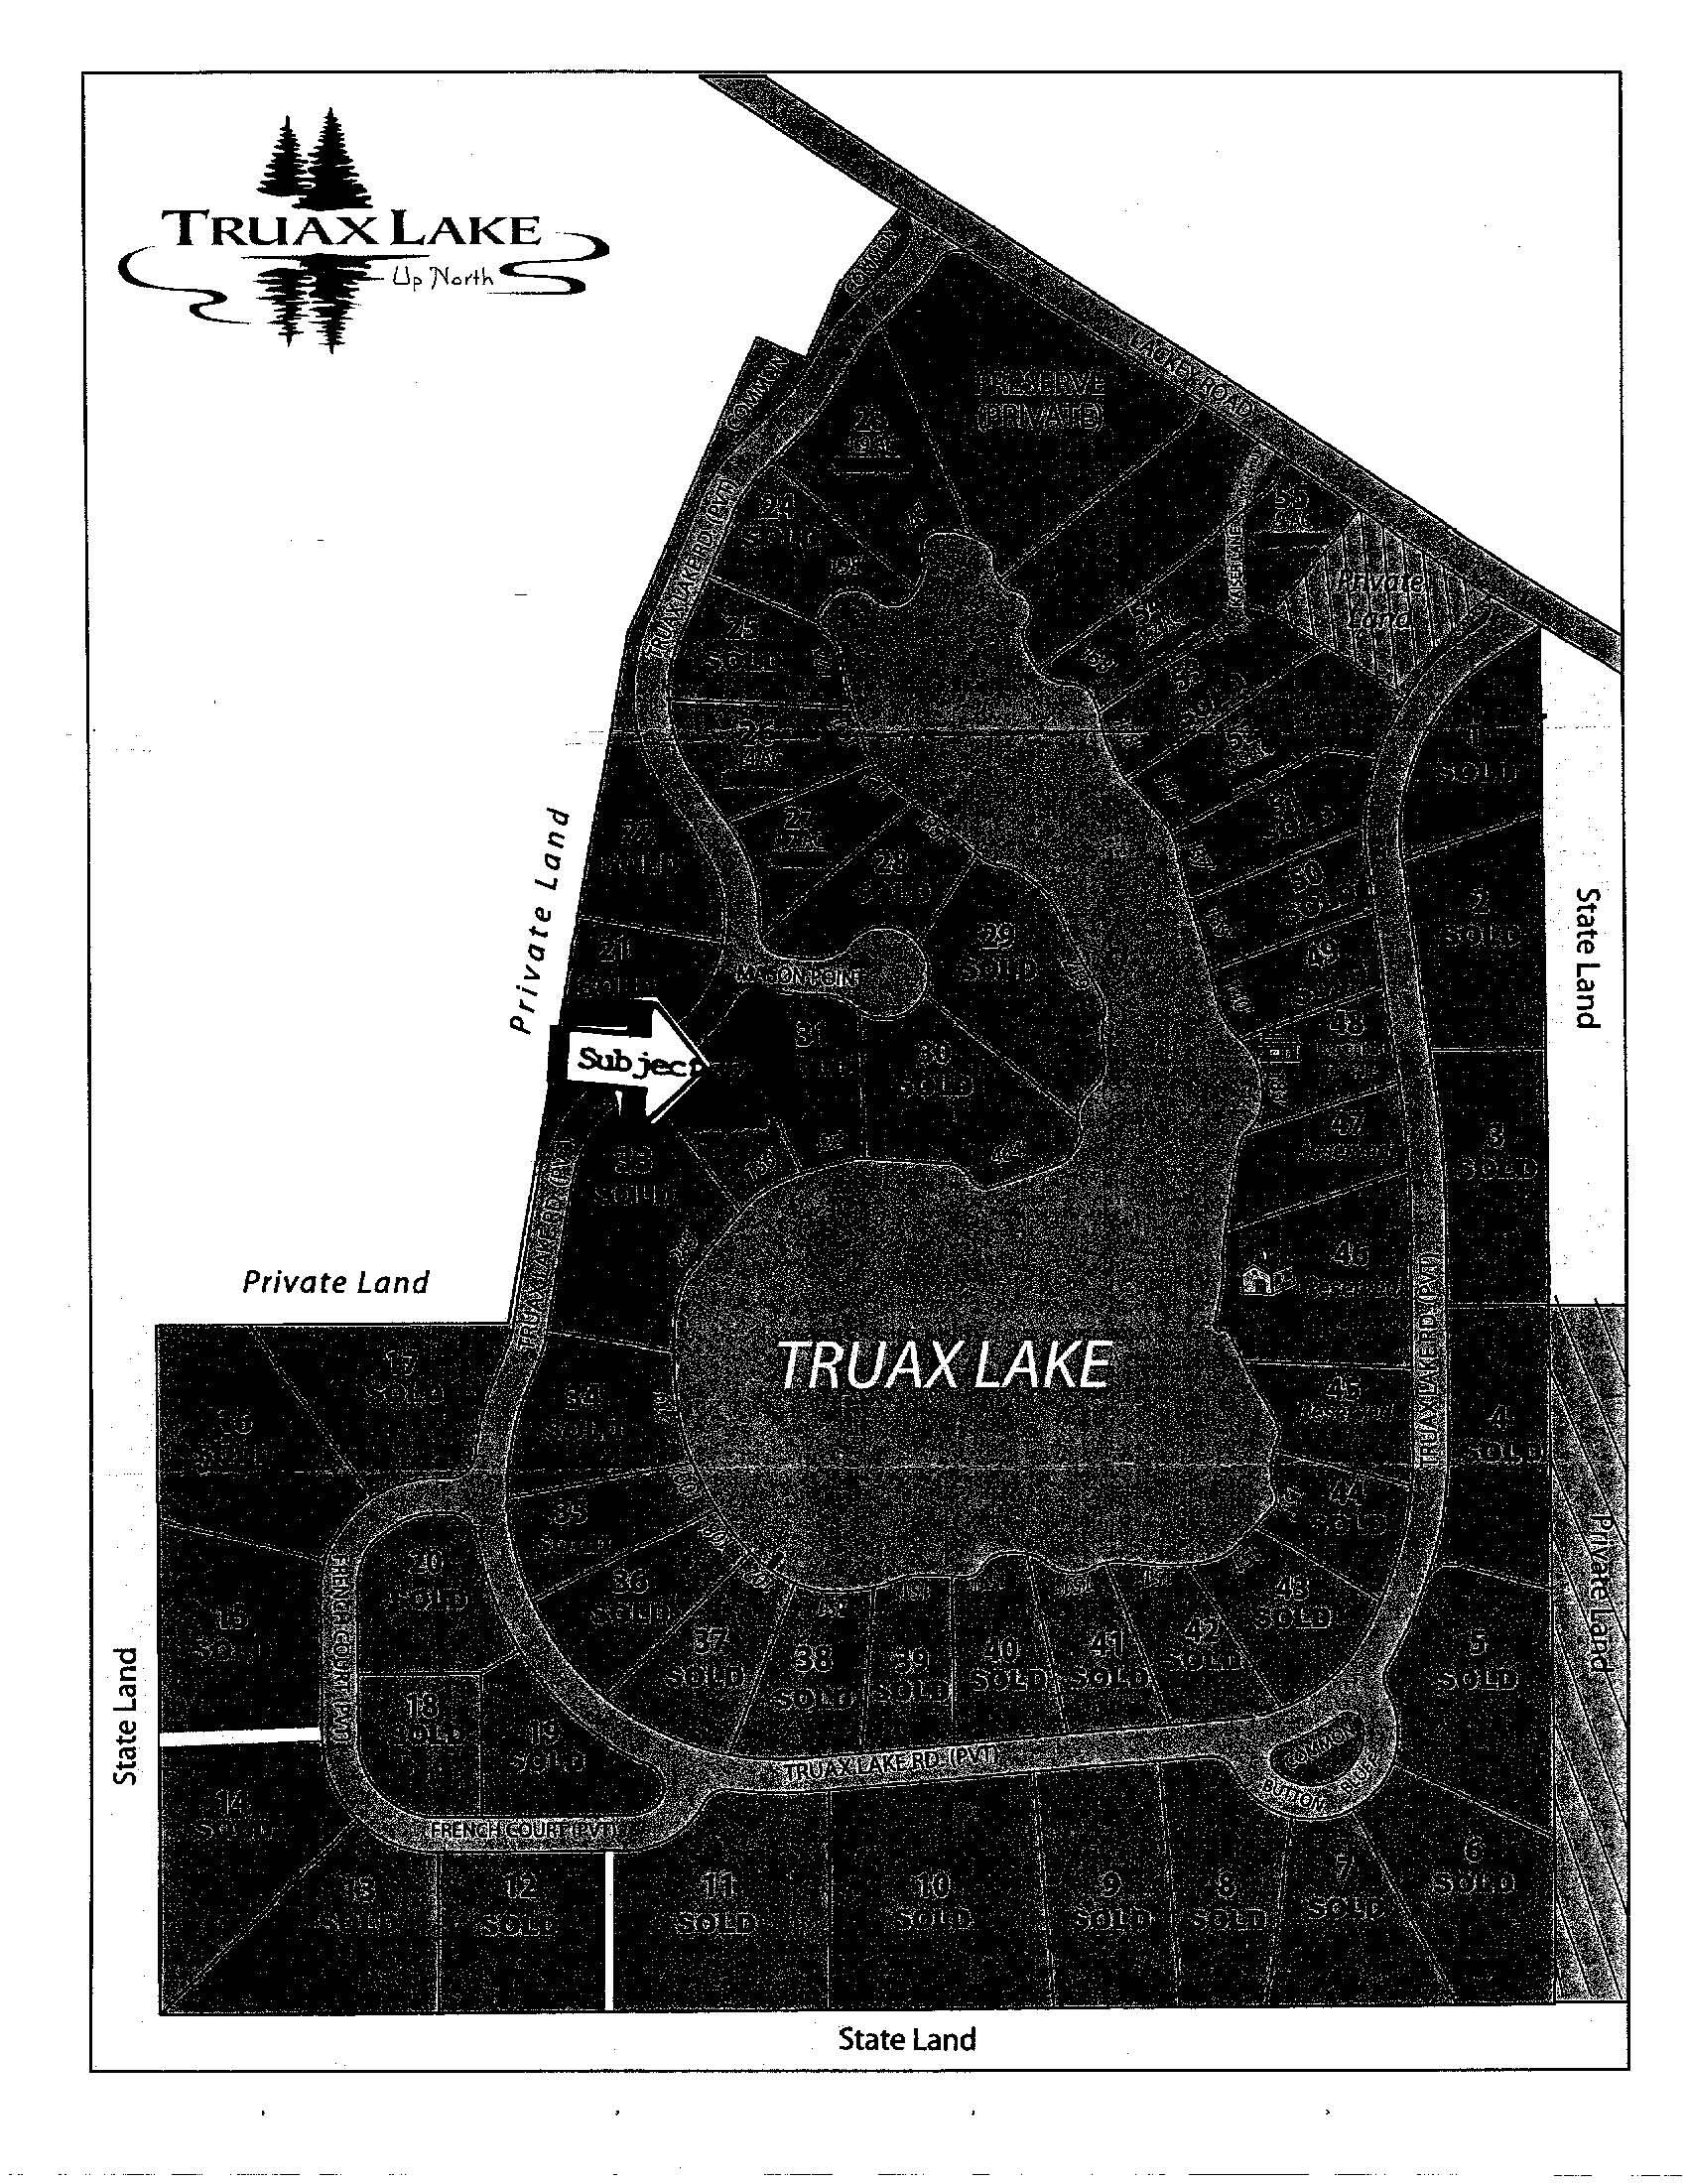 4936 Truax Lake Road, Williamsburg Marketing - For Sale by Oltersdorf Realty LLC (10).jpg